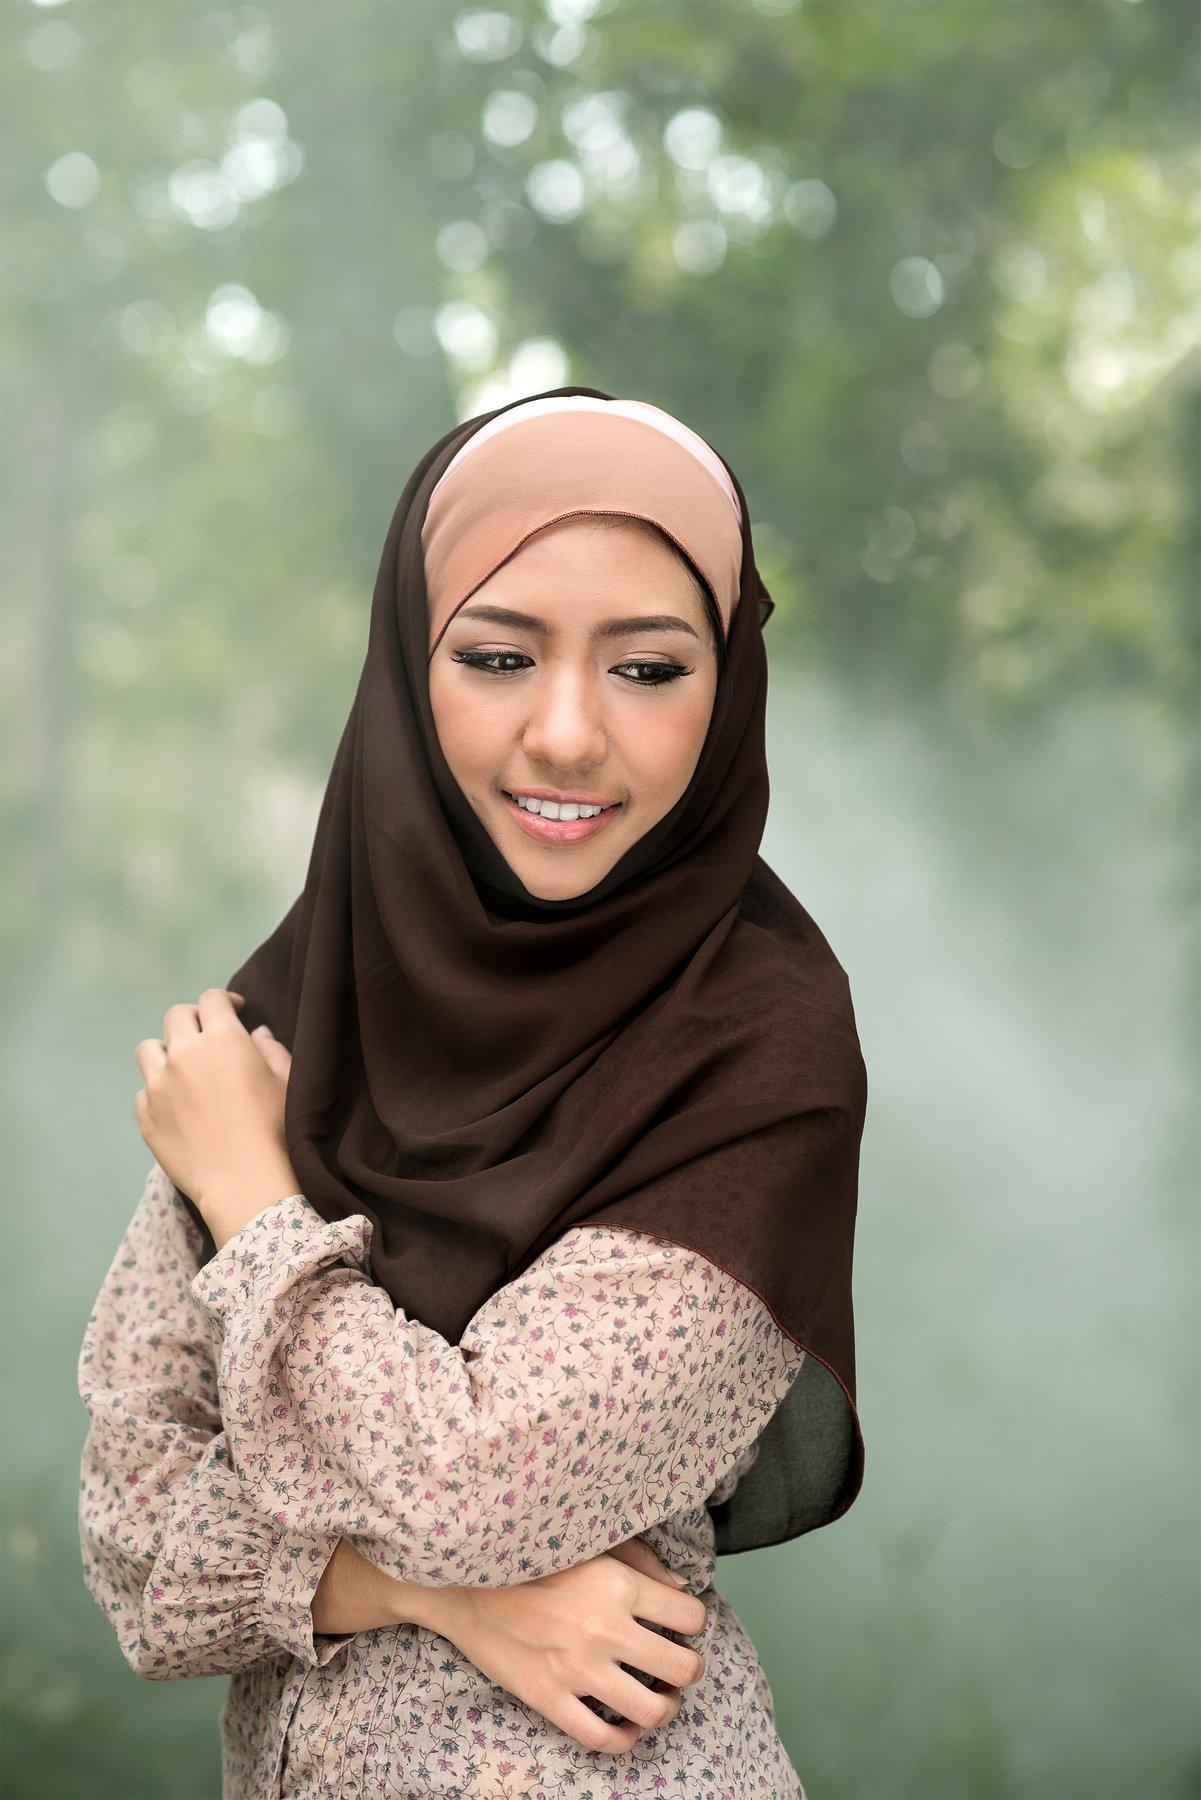 muslim,day,portrait,women,southeast asia,lifestyle,, SUTIPORN SOMNAM